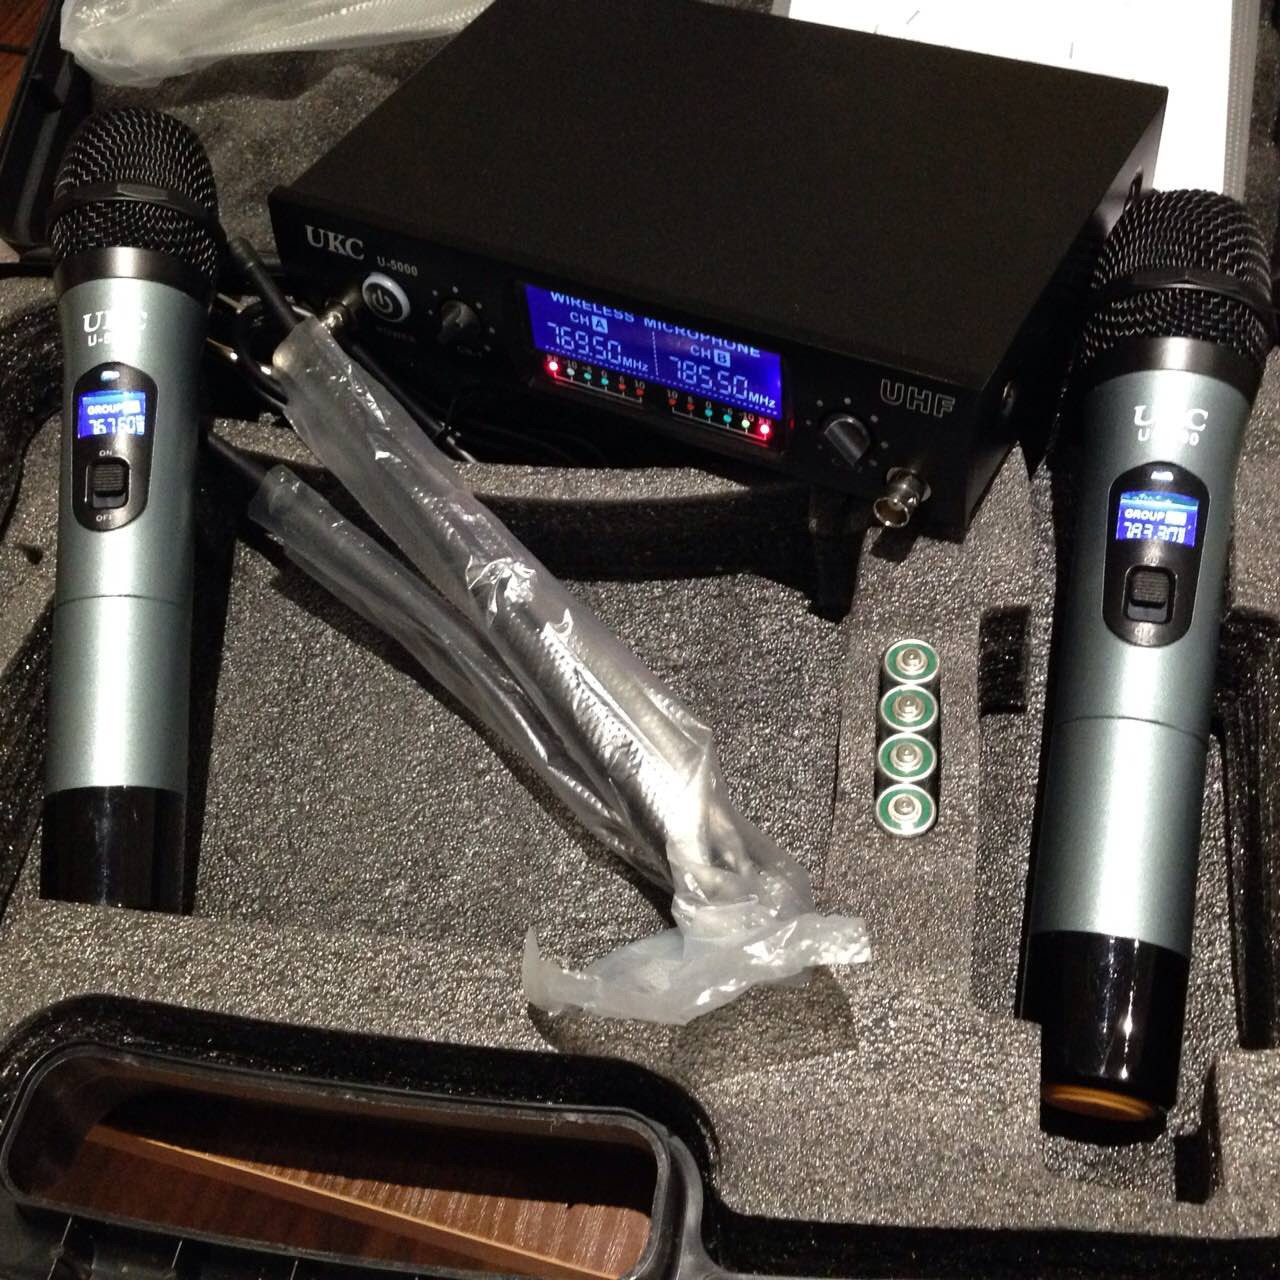 Микрофон UKC DM-5000  UHF база 2 радиомикрофона  Новинка !!!